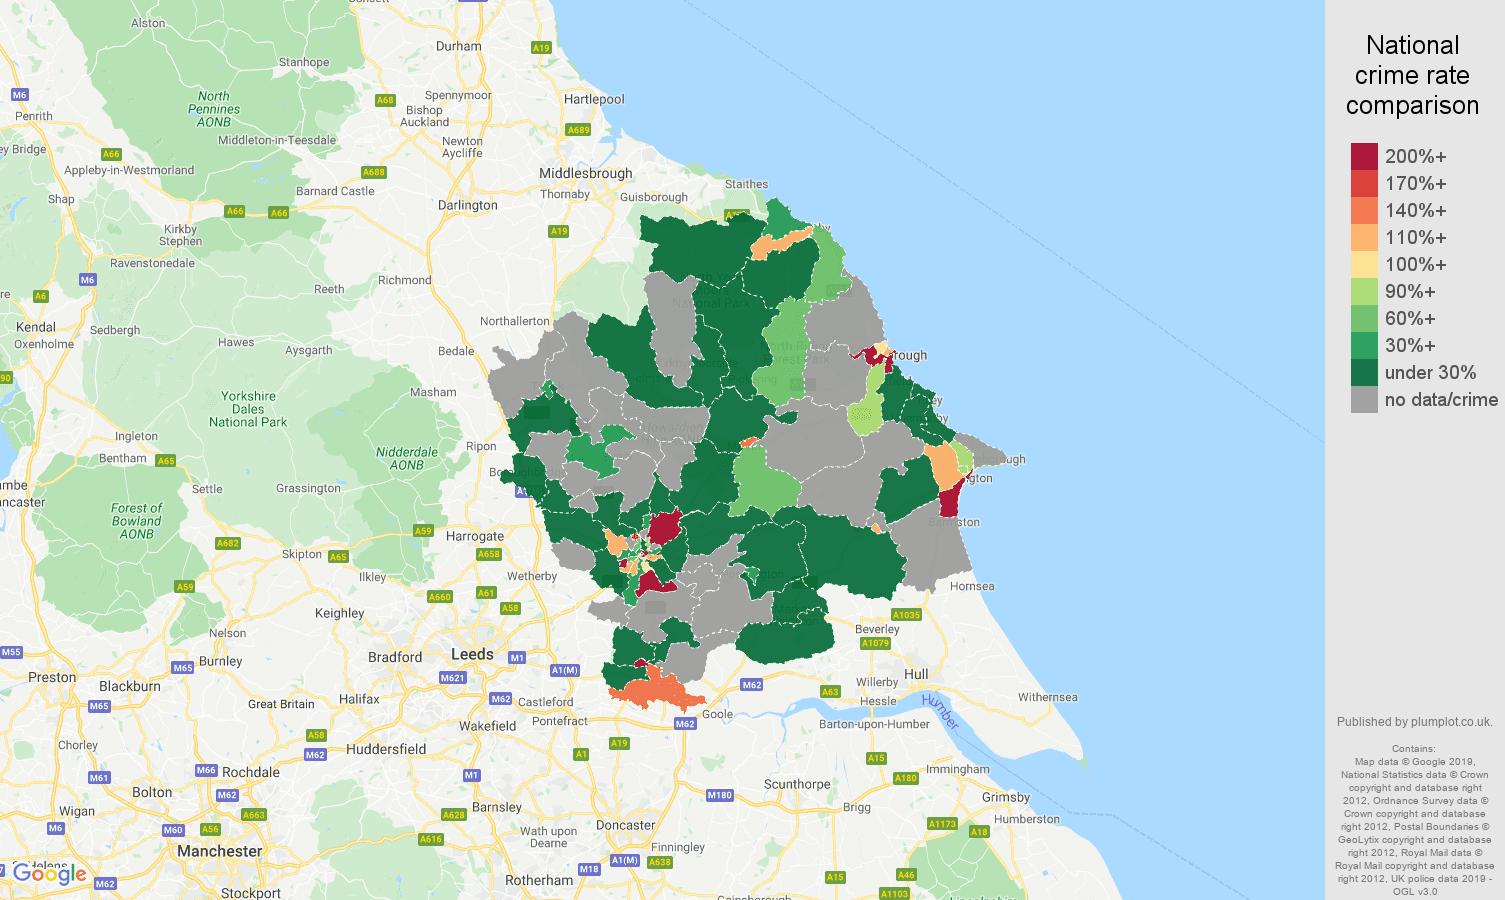 York shoplifting crime rate comparison map